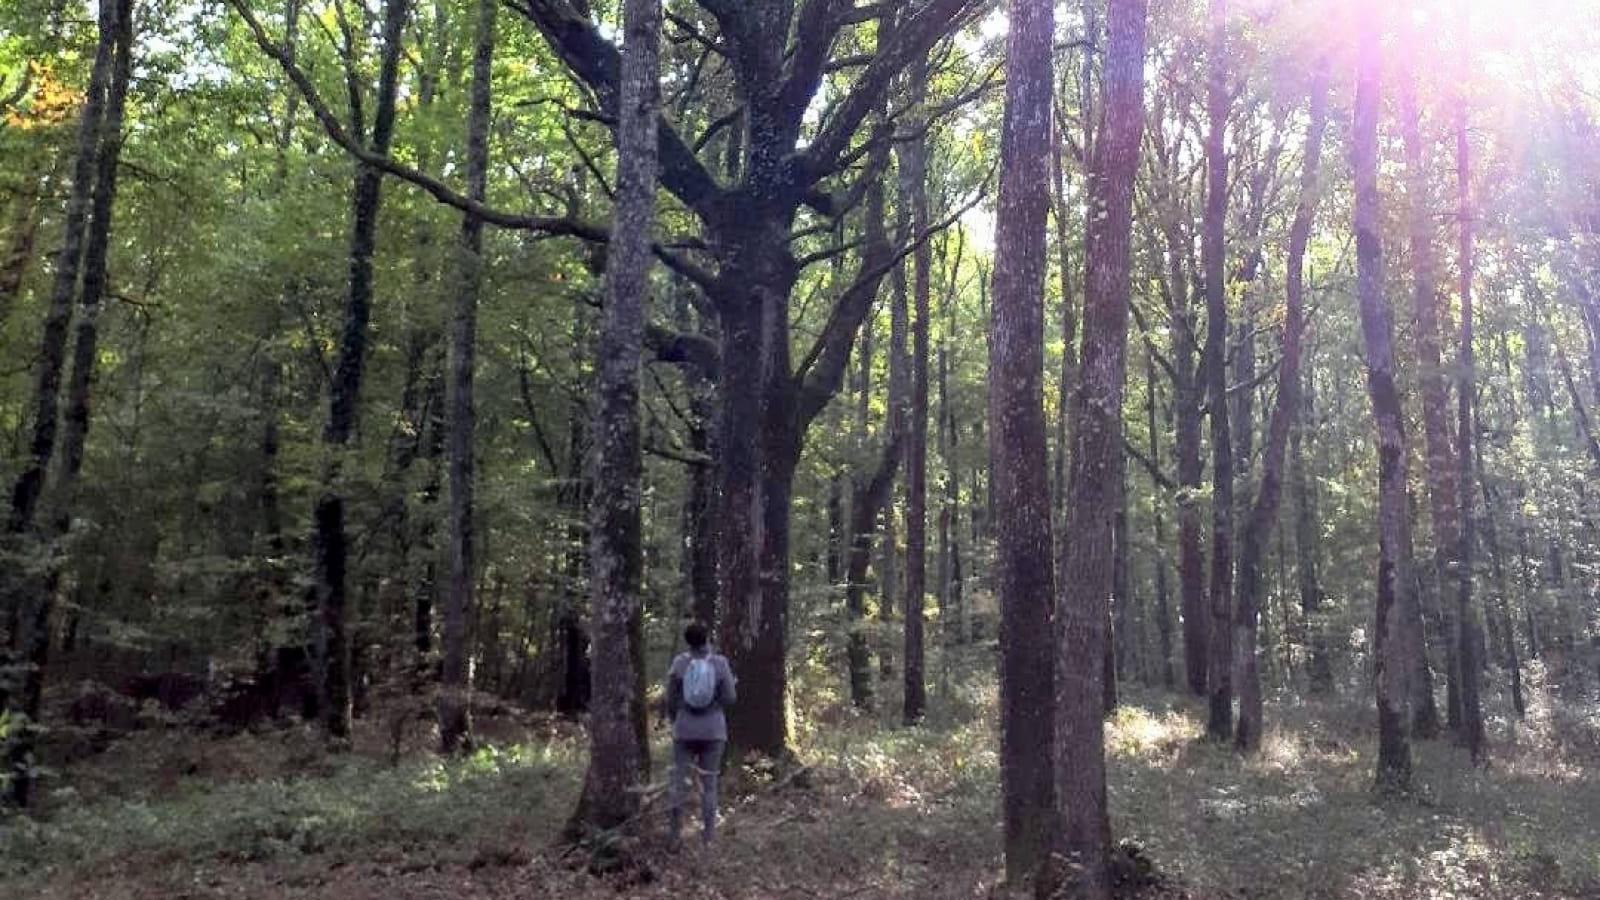 OMTANI Bain de forêt